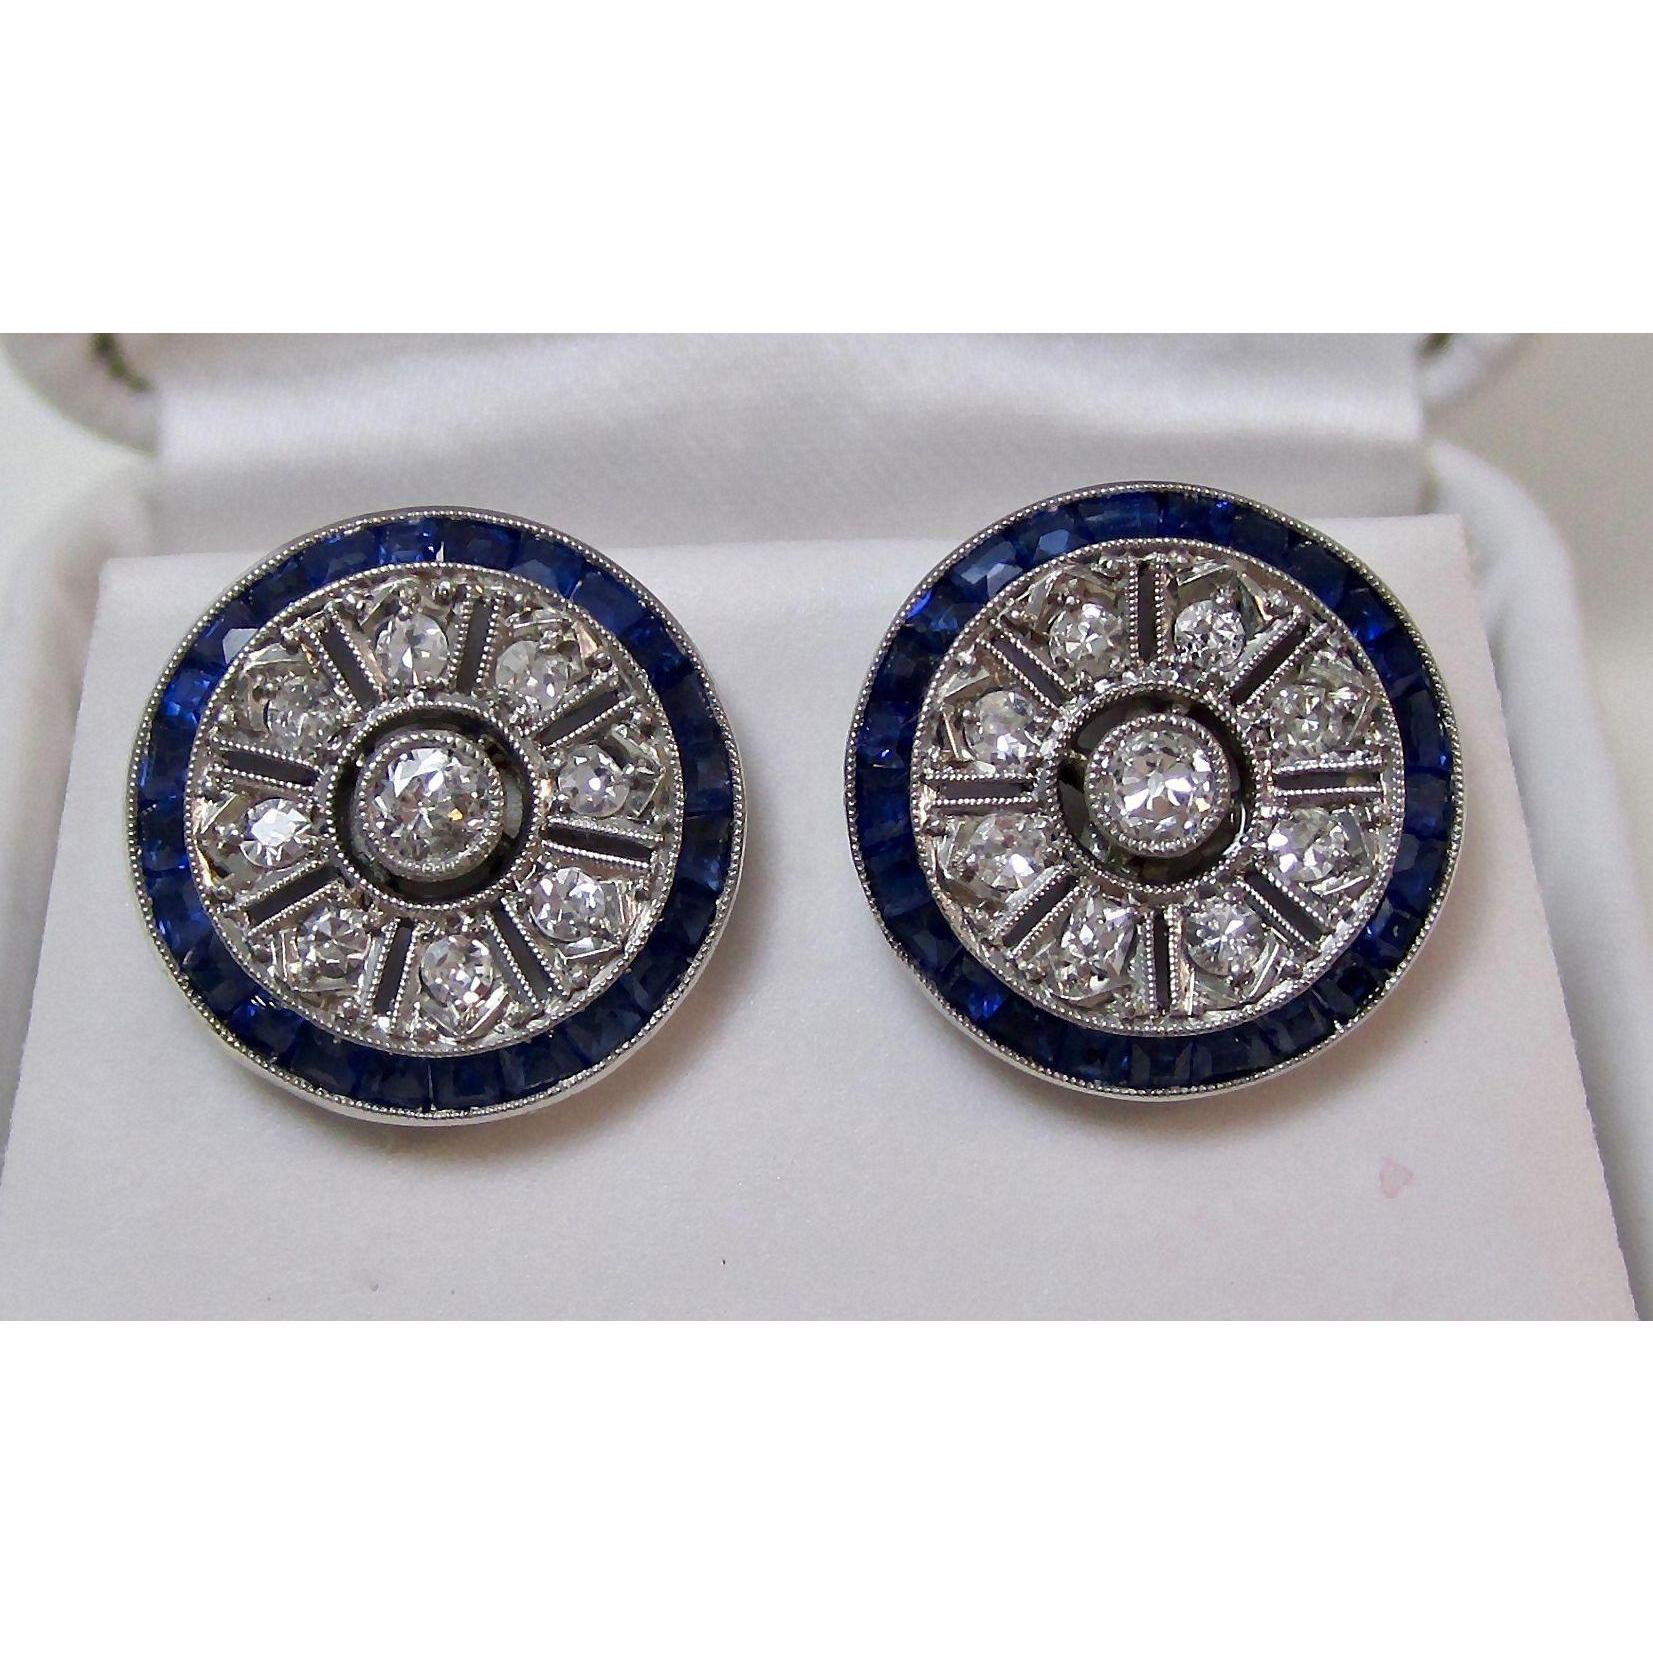 Art Deco Natural Sapphire & Diamond Wedding Day Birthstone Earrings 18K